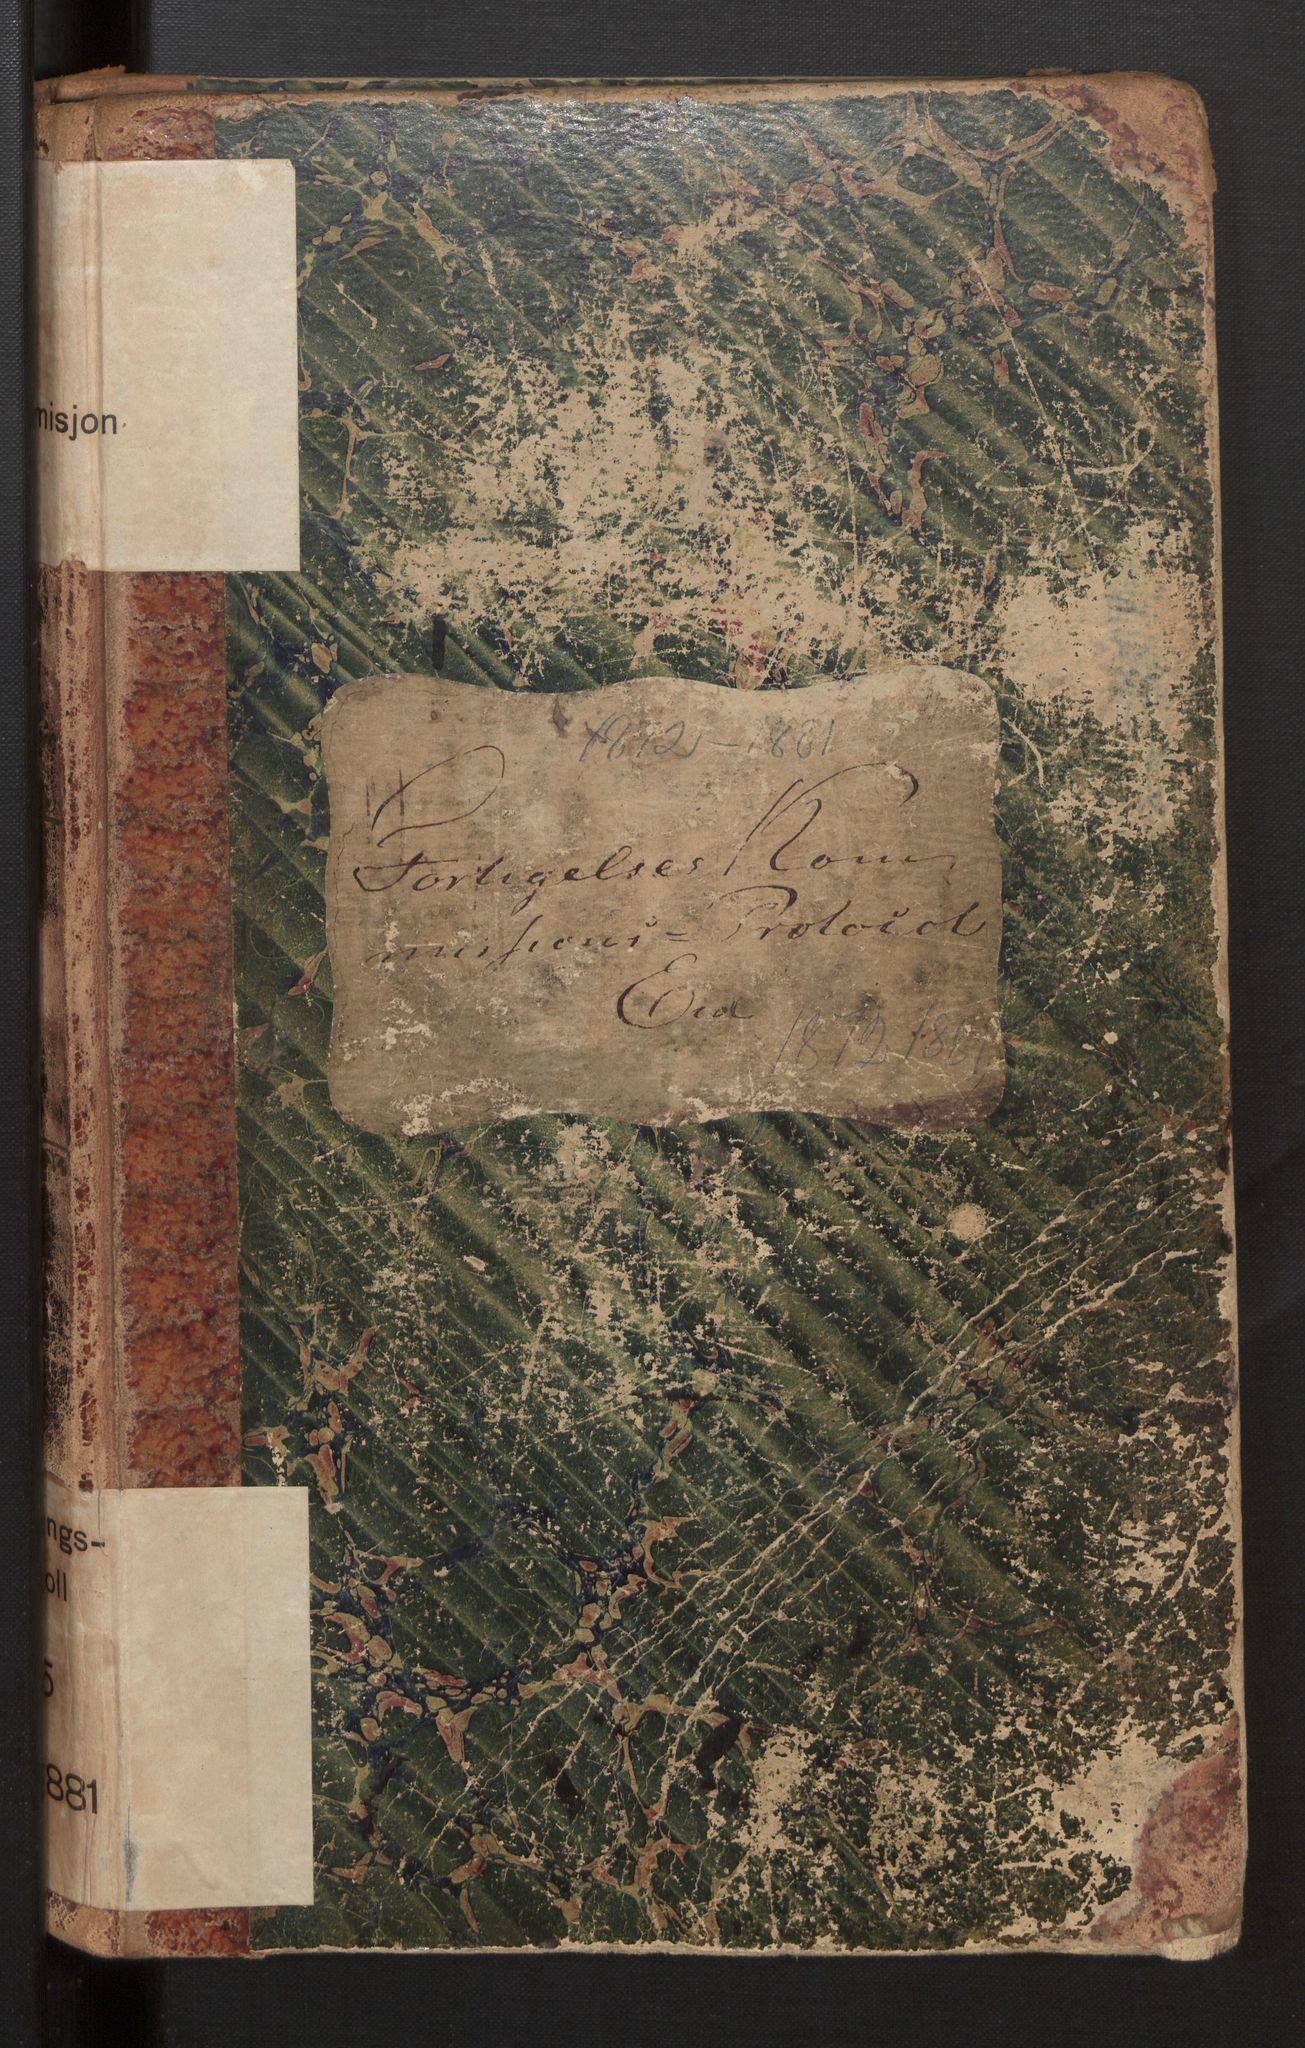 SAB, Eid (og Davik) forliksråd, A/L0005: Forhandlingsprotokoll, 1872-1881